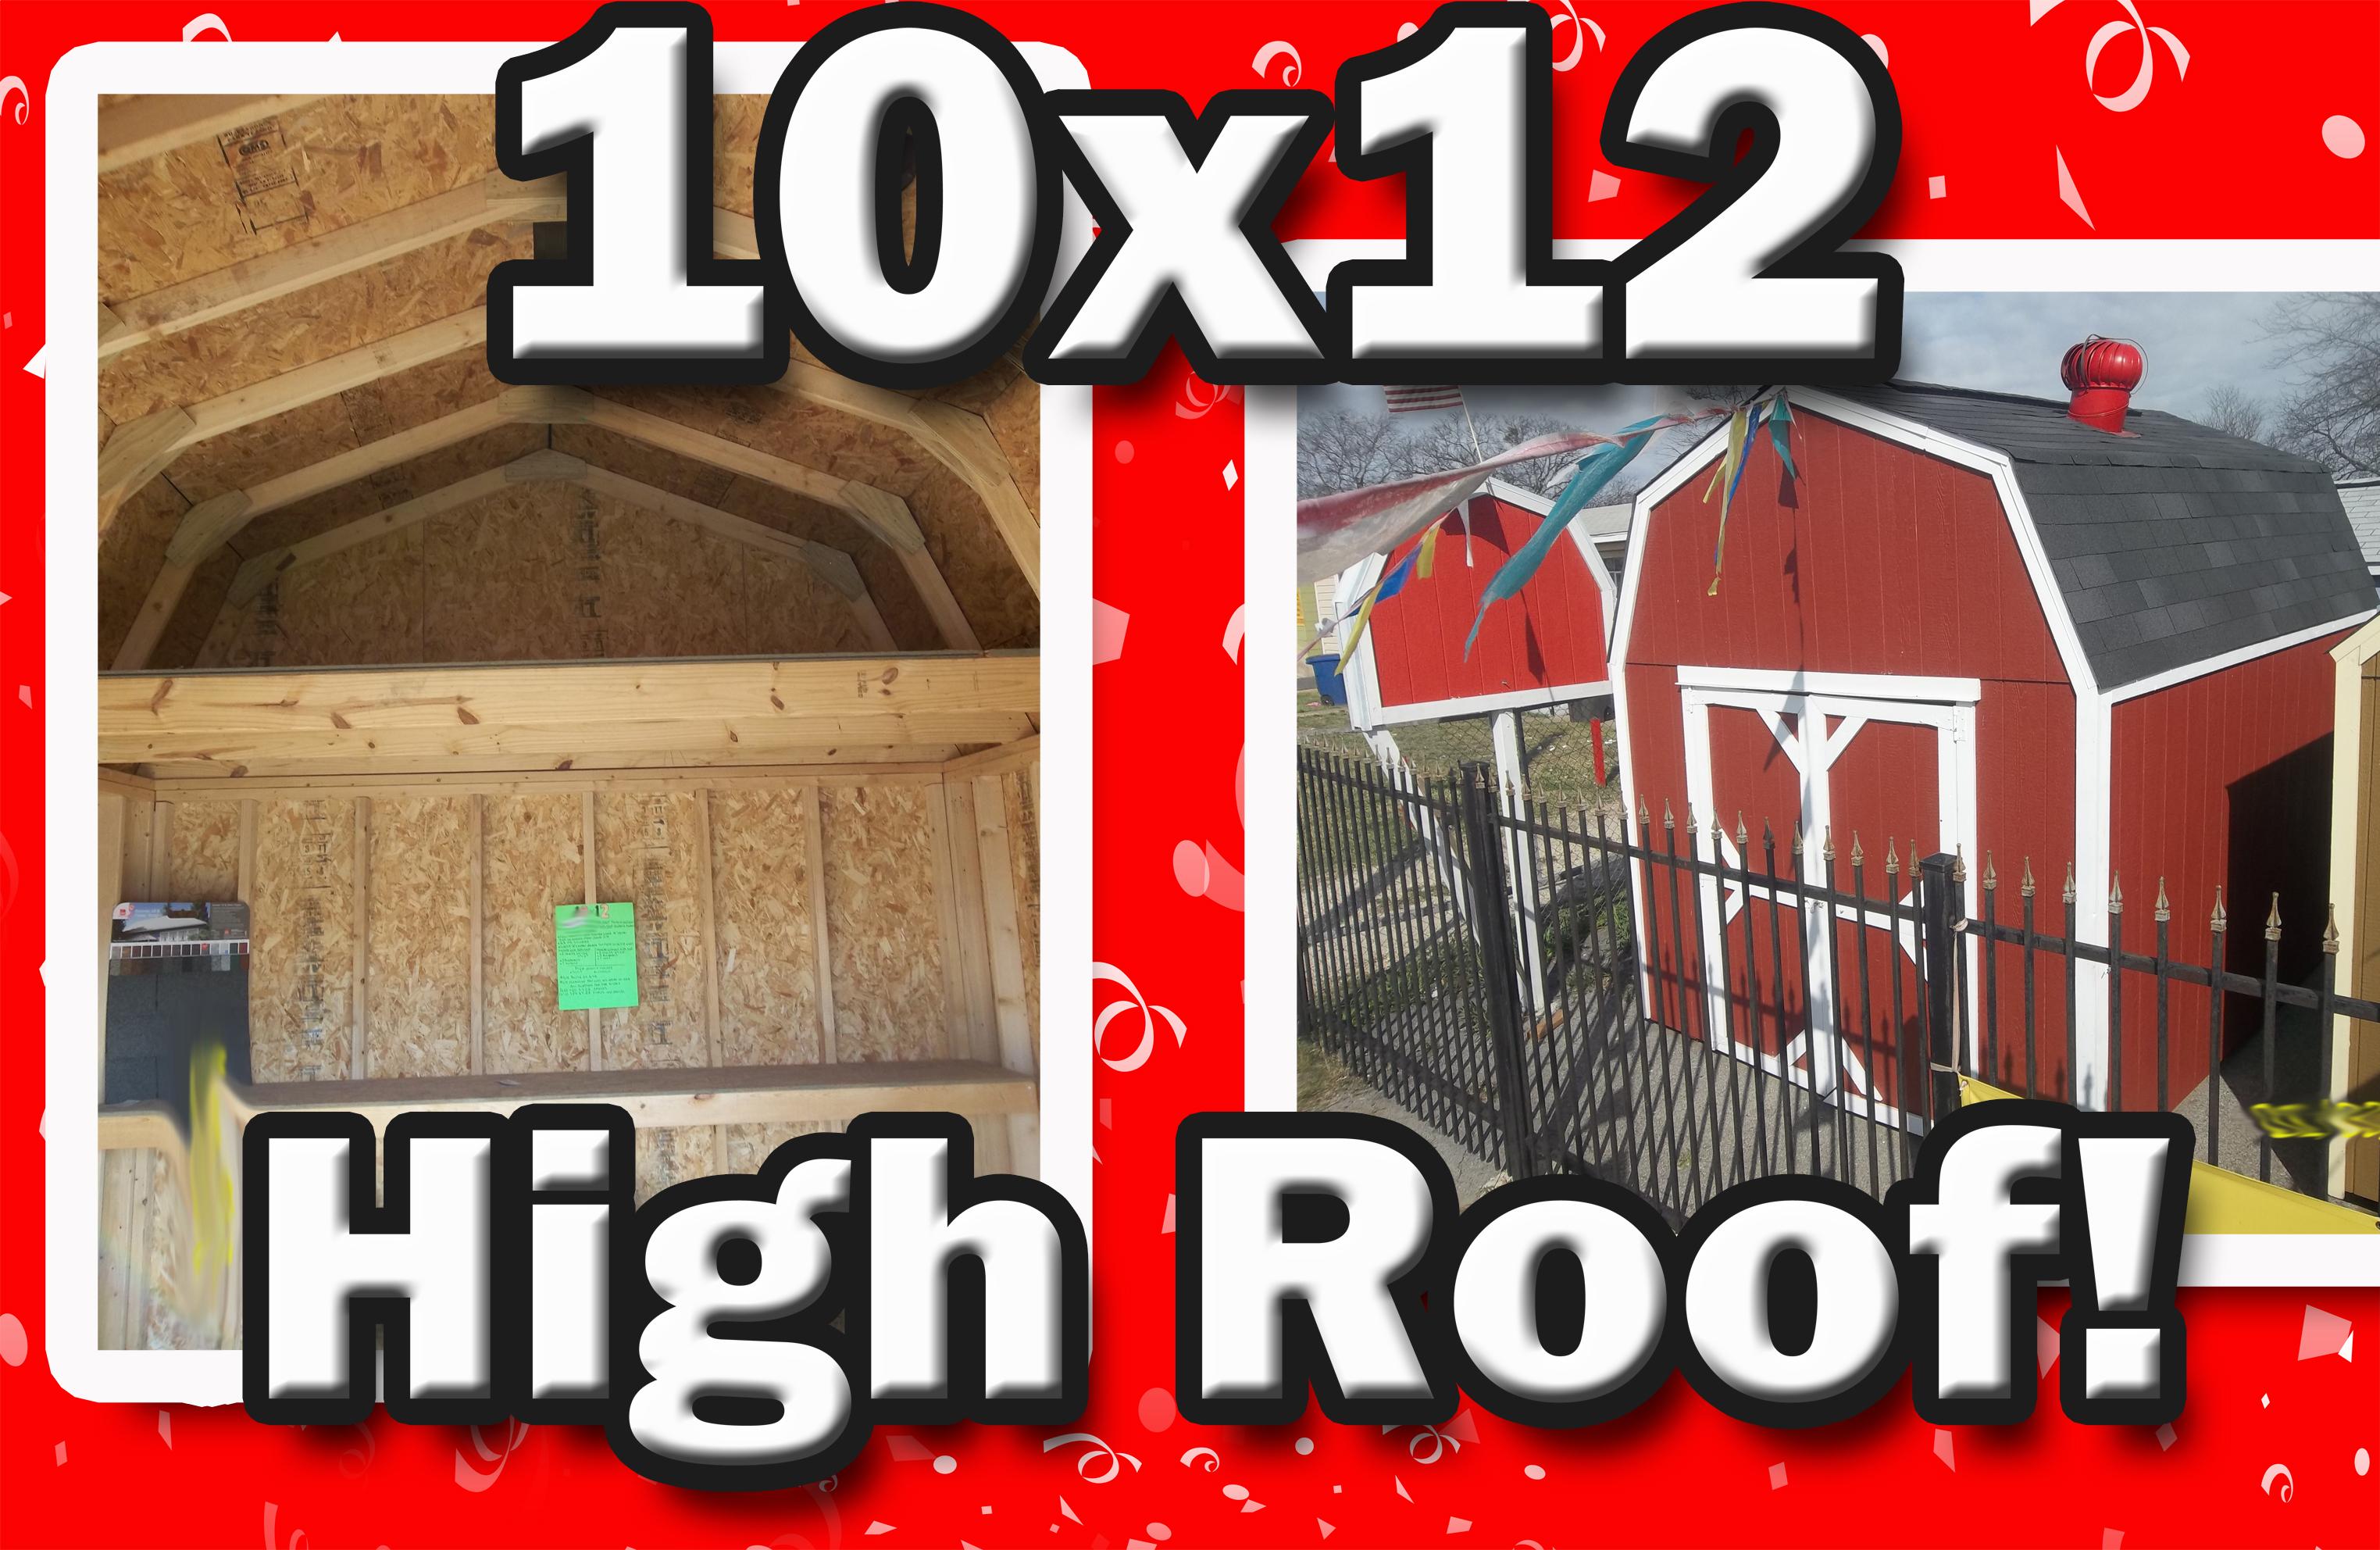 Cene: Free access Diy shed kit home depot